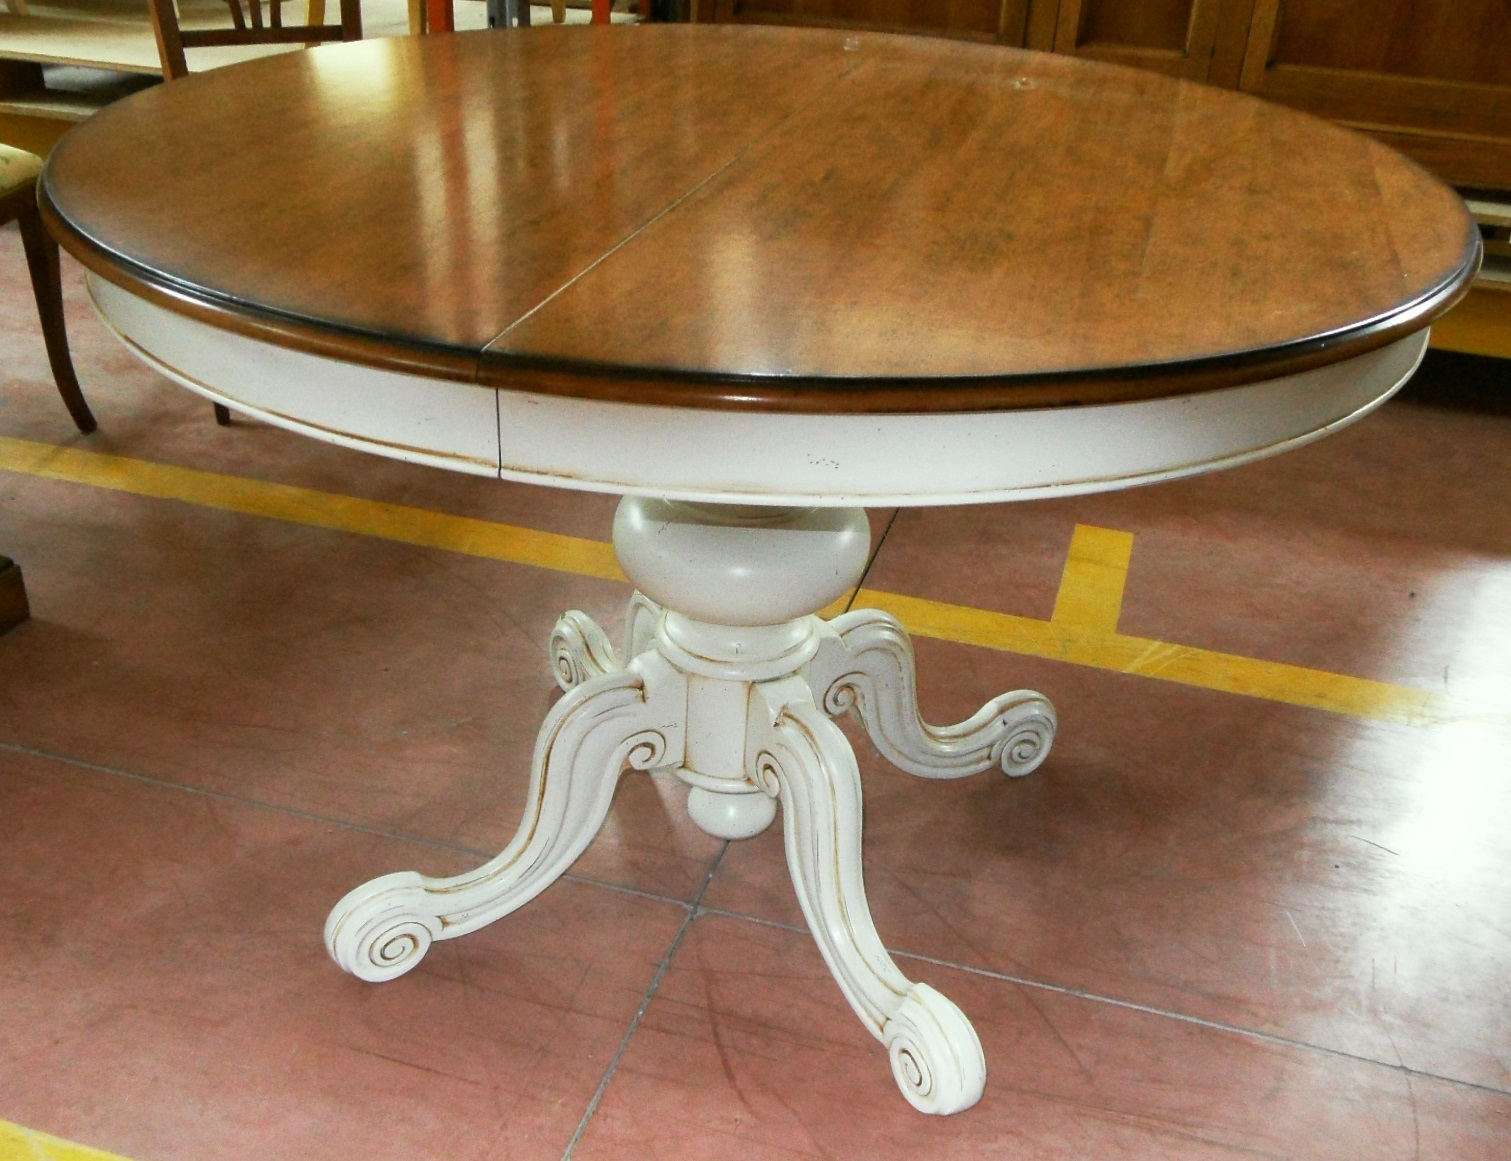 Tavolo rotondo allungabile scontato del 50 tavoli a - Tavolo rotondo allungabile prezzi ...